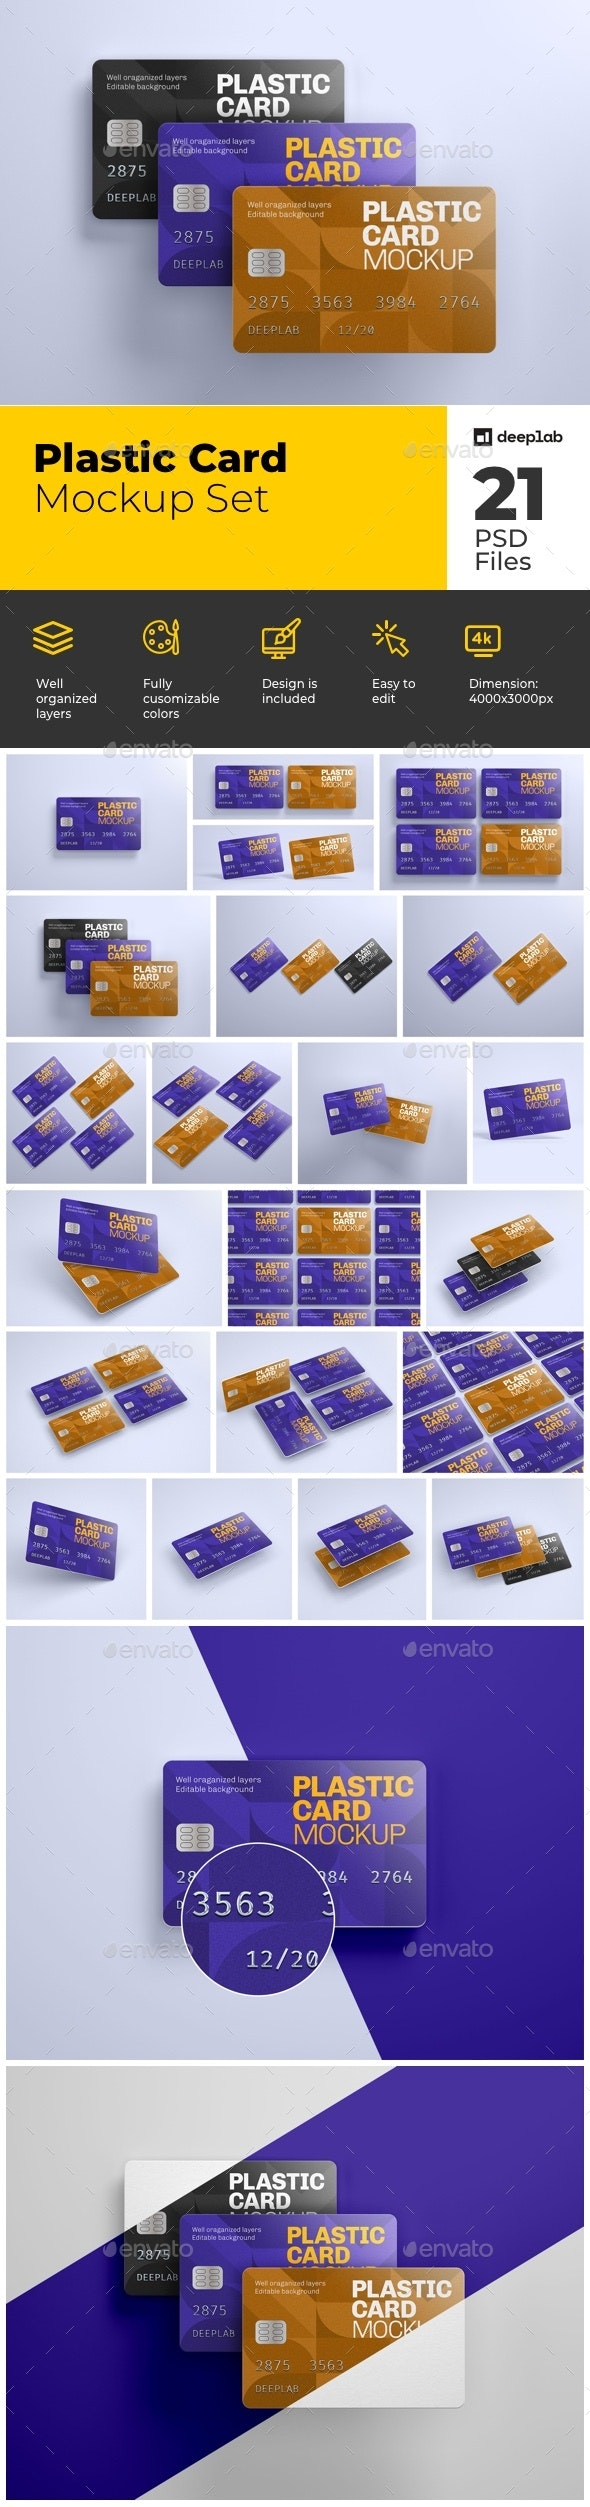 Plastic Card Mockup Set - Product Mock-Ups Graphics